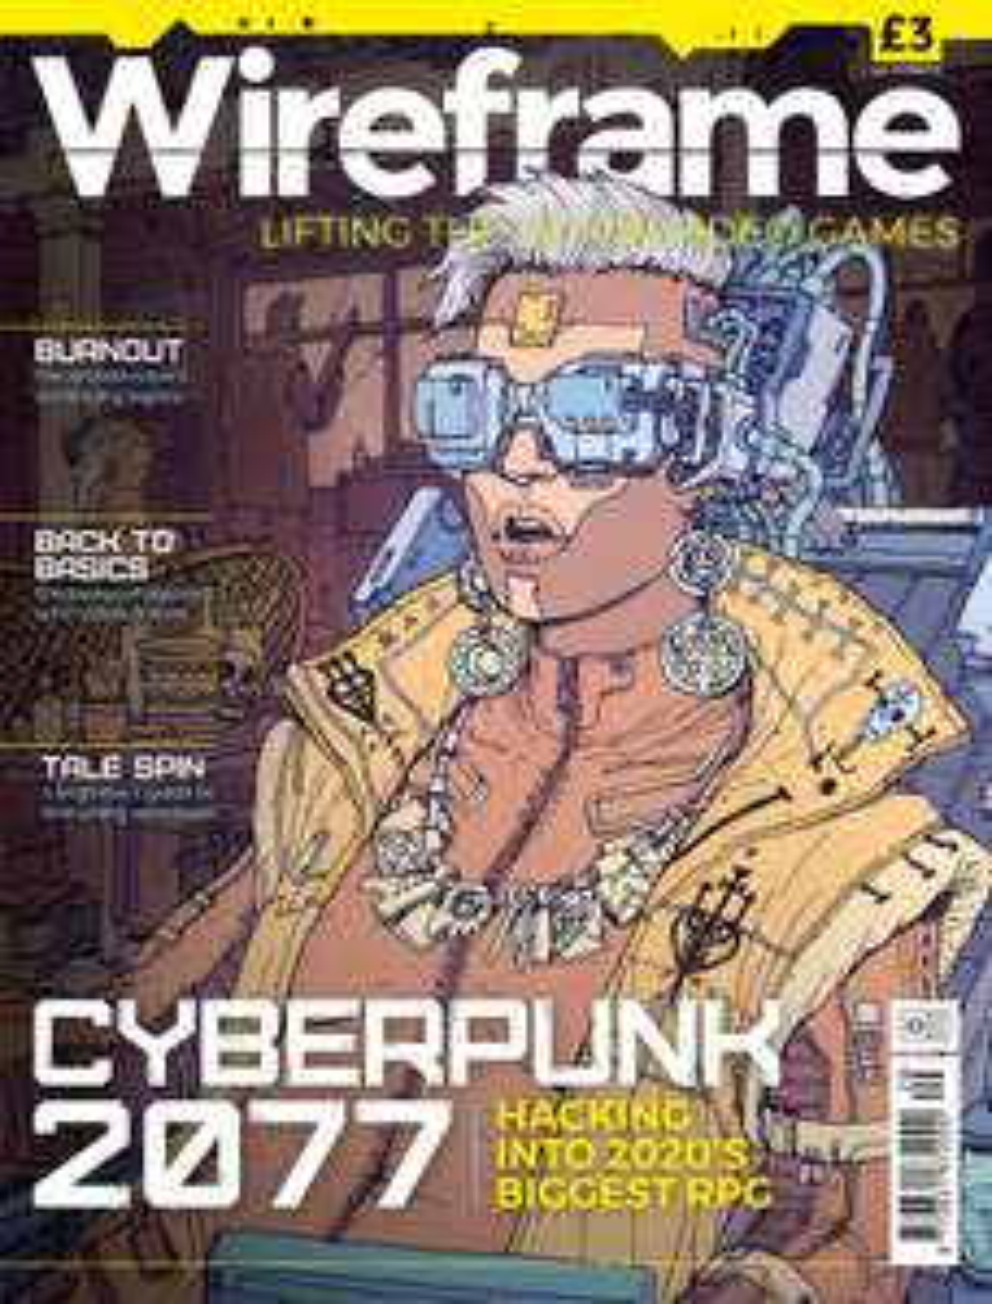 Free Wireframe magazine downloads